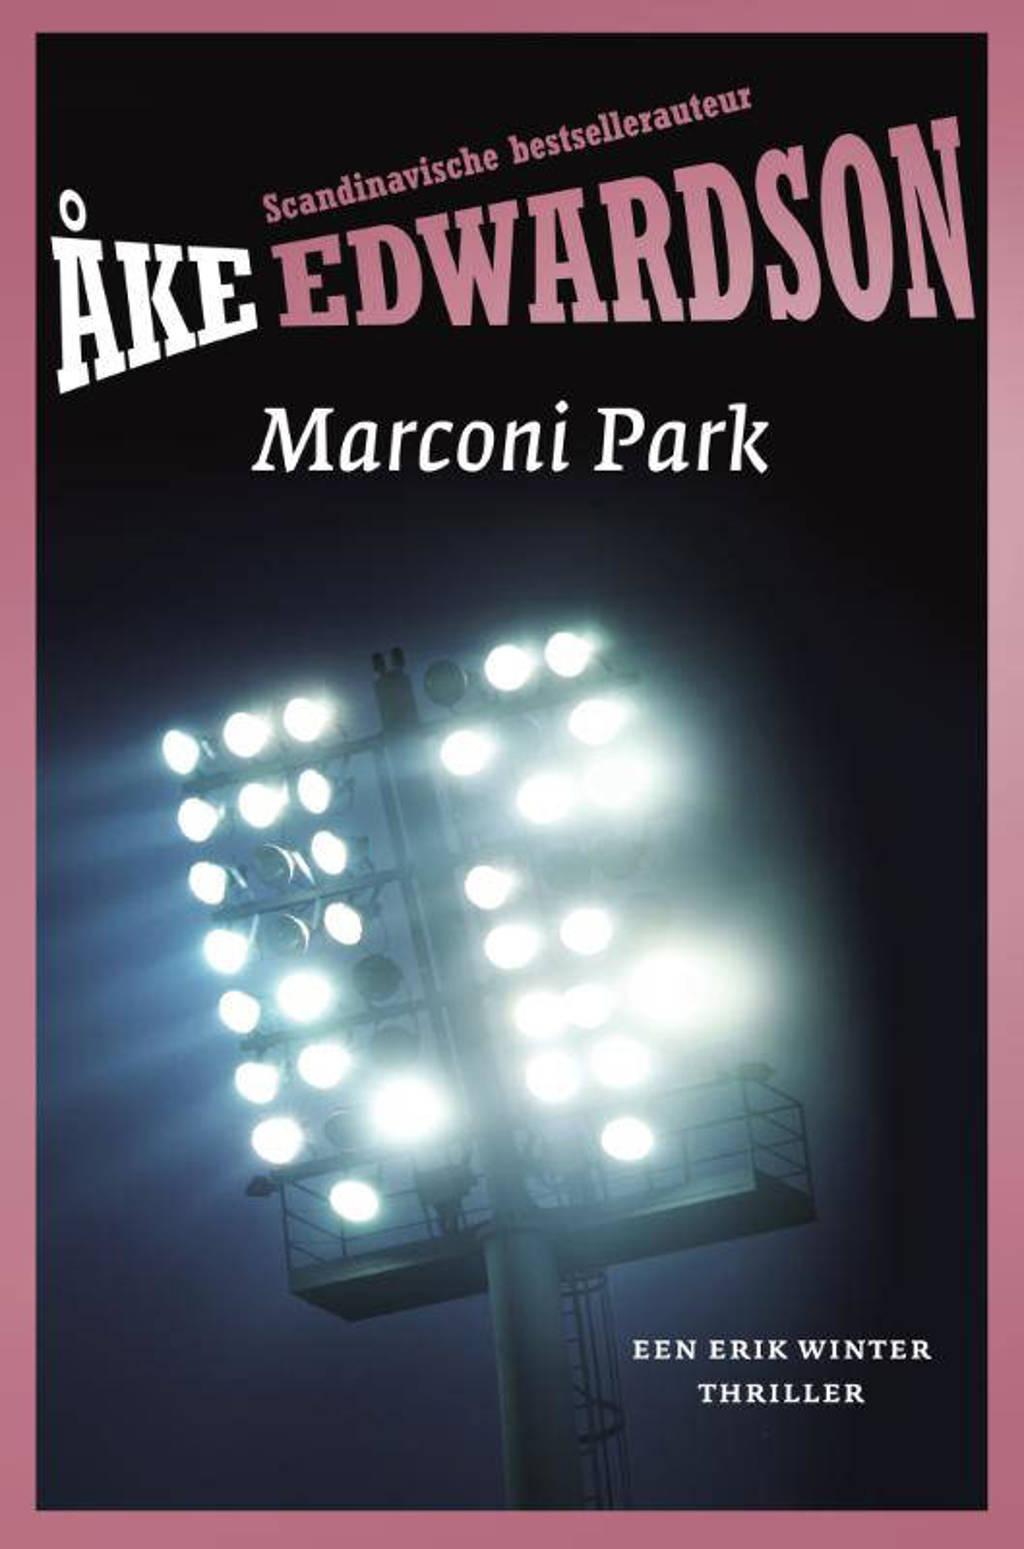 Erik Winter: Marconi park - Åke Edwardson